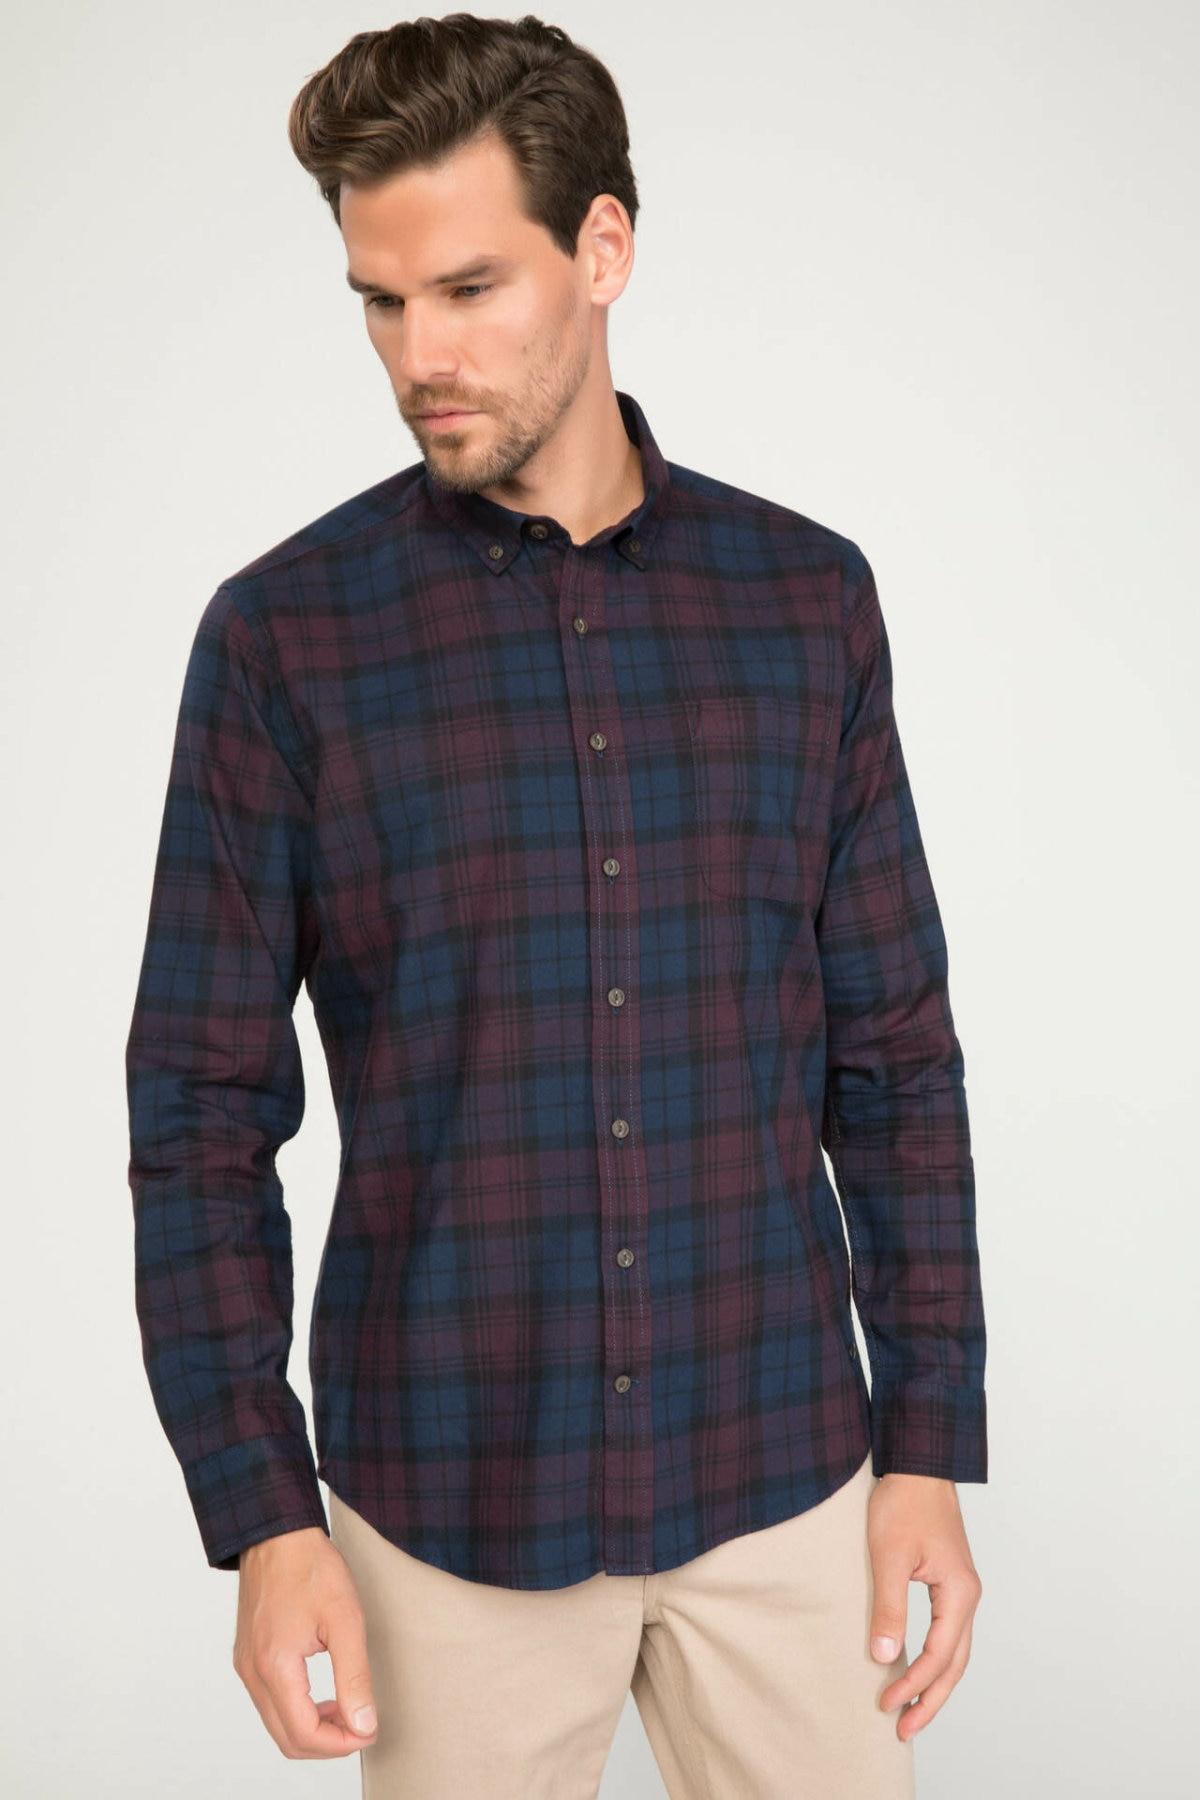 DeFacto Man Dark Color Long Sleeve Shirt Men Casual Plaid Turn-down Collar Shirt Male Top Cloth-J1417AZ18WN